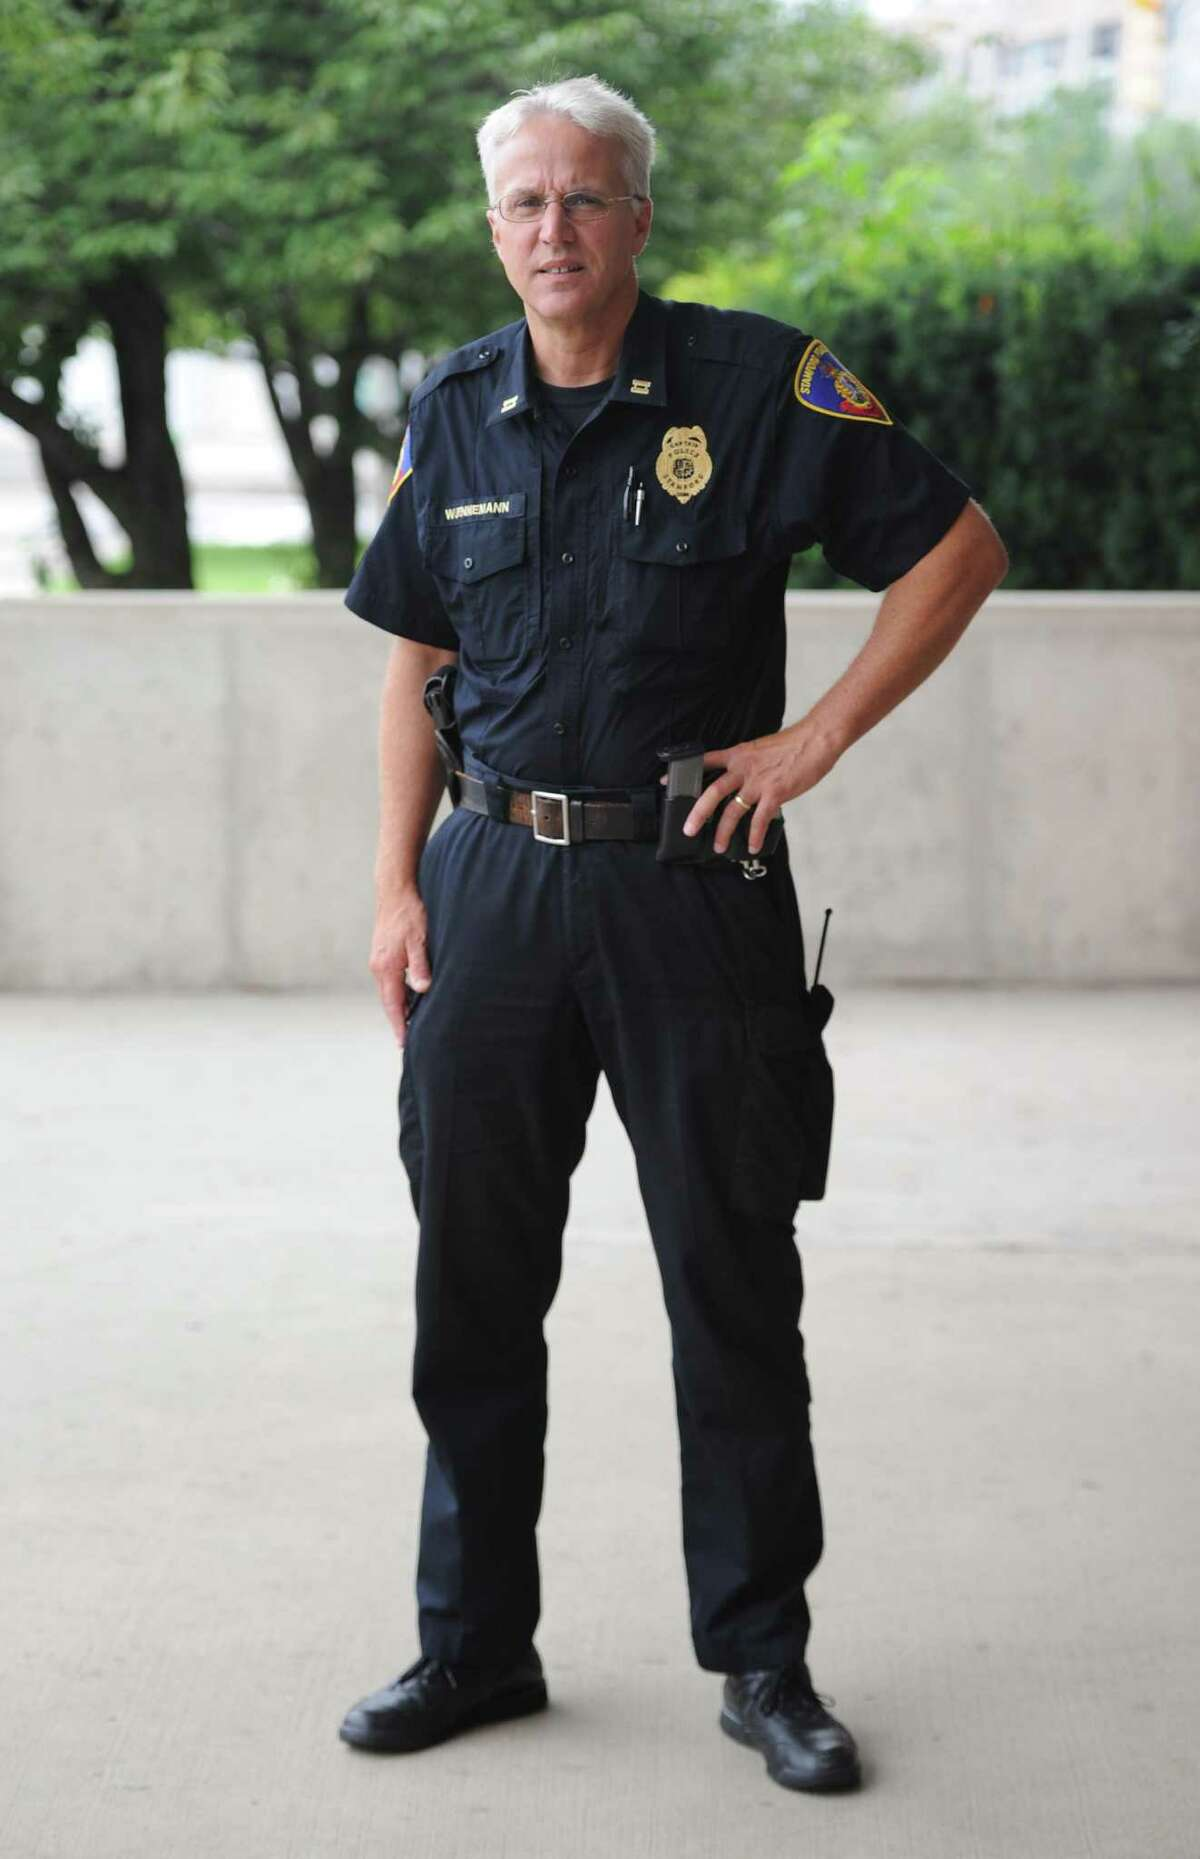 Assistant Chief Thomas Wuennemann